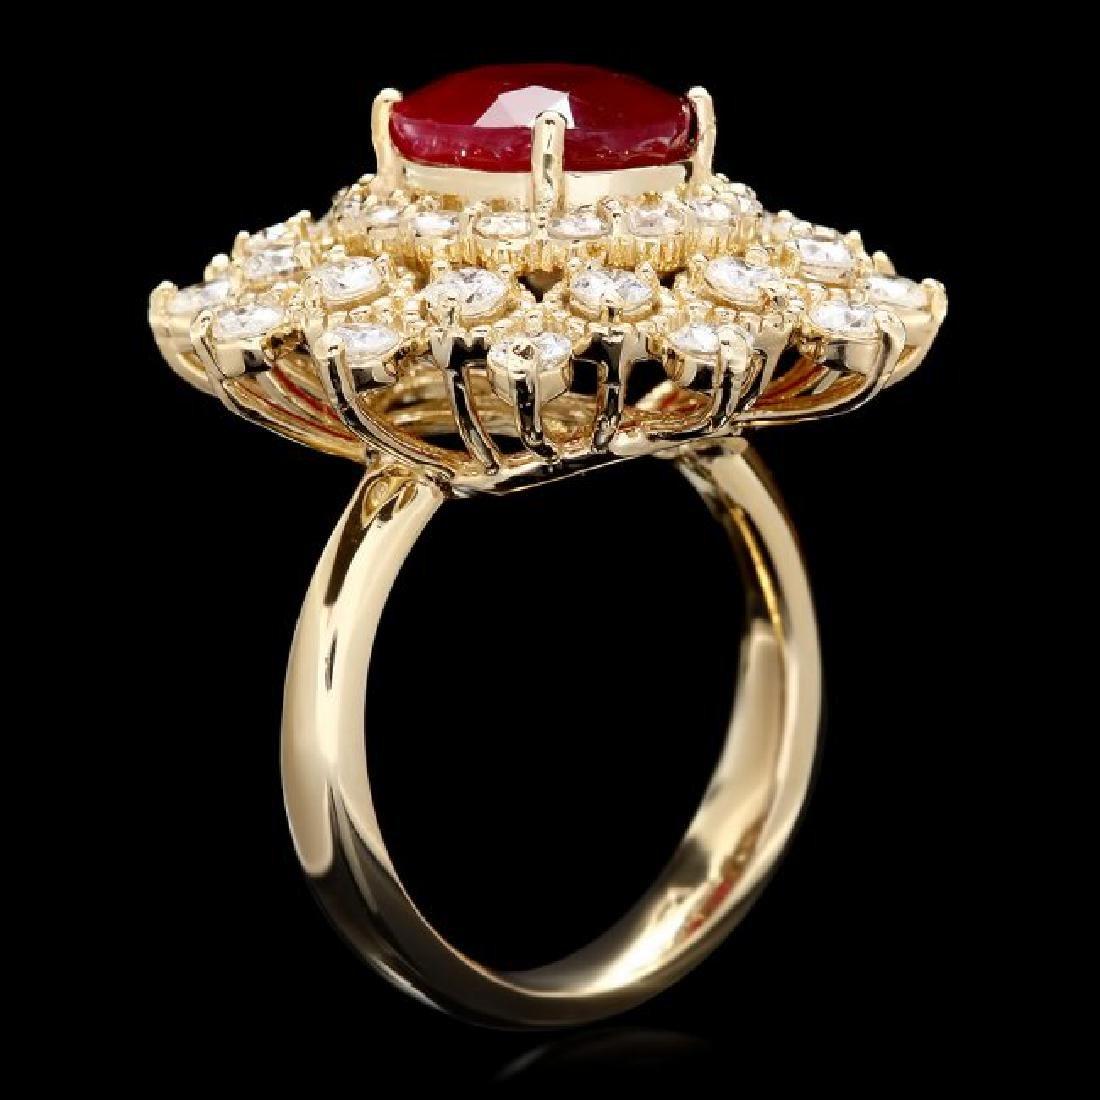 14k Yellow Gold 4.00ct Ruby 2.00ct Diamond Ring - 3